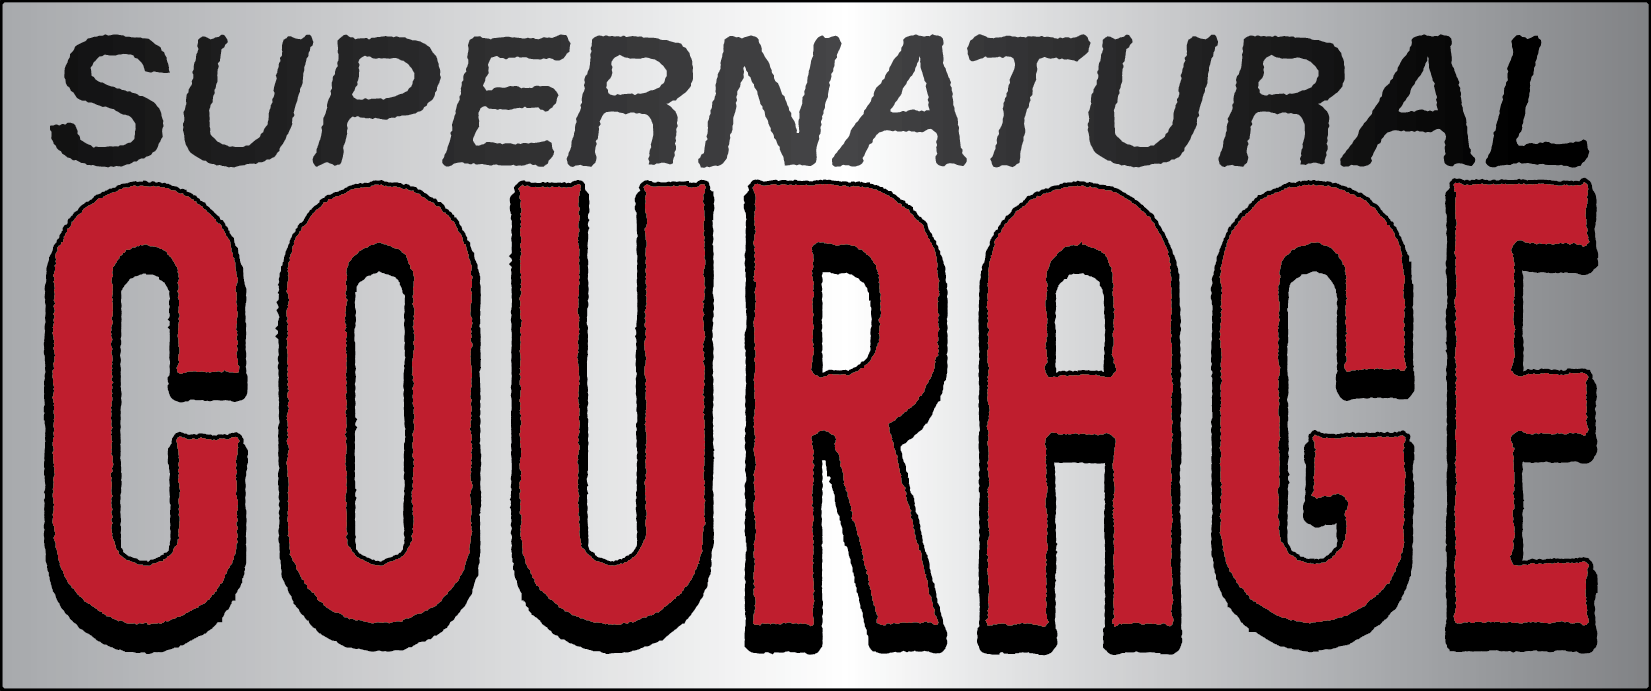 Supernatural Courage Logo-02.png